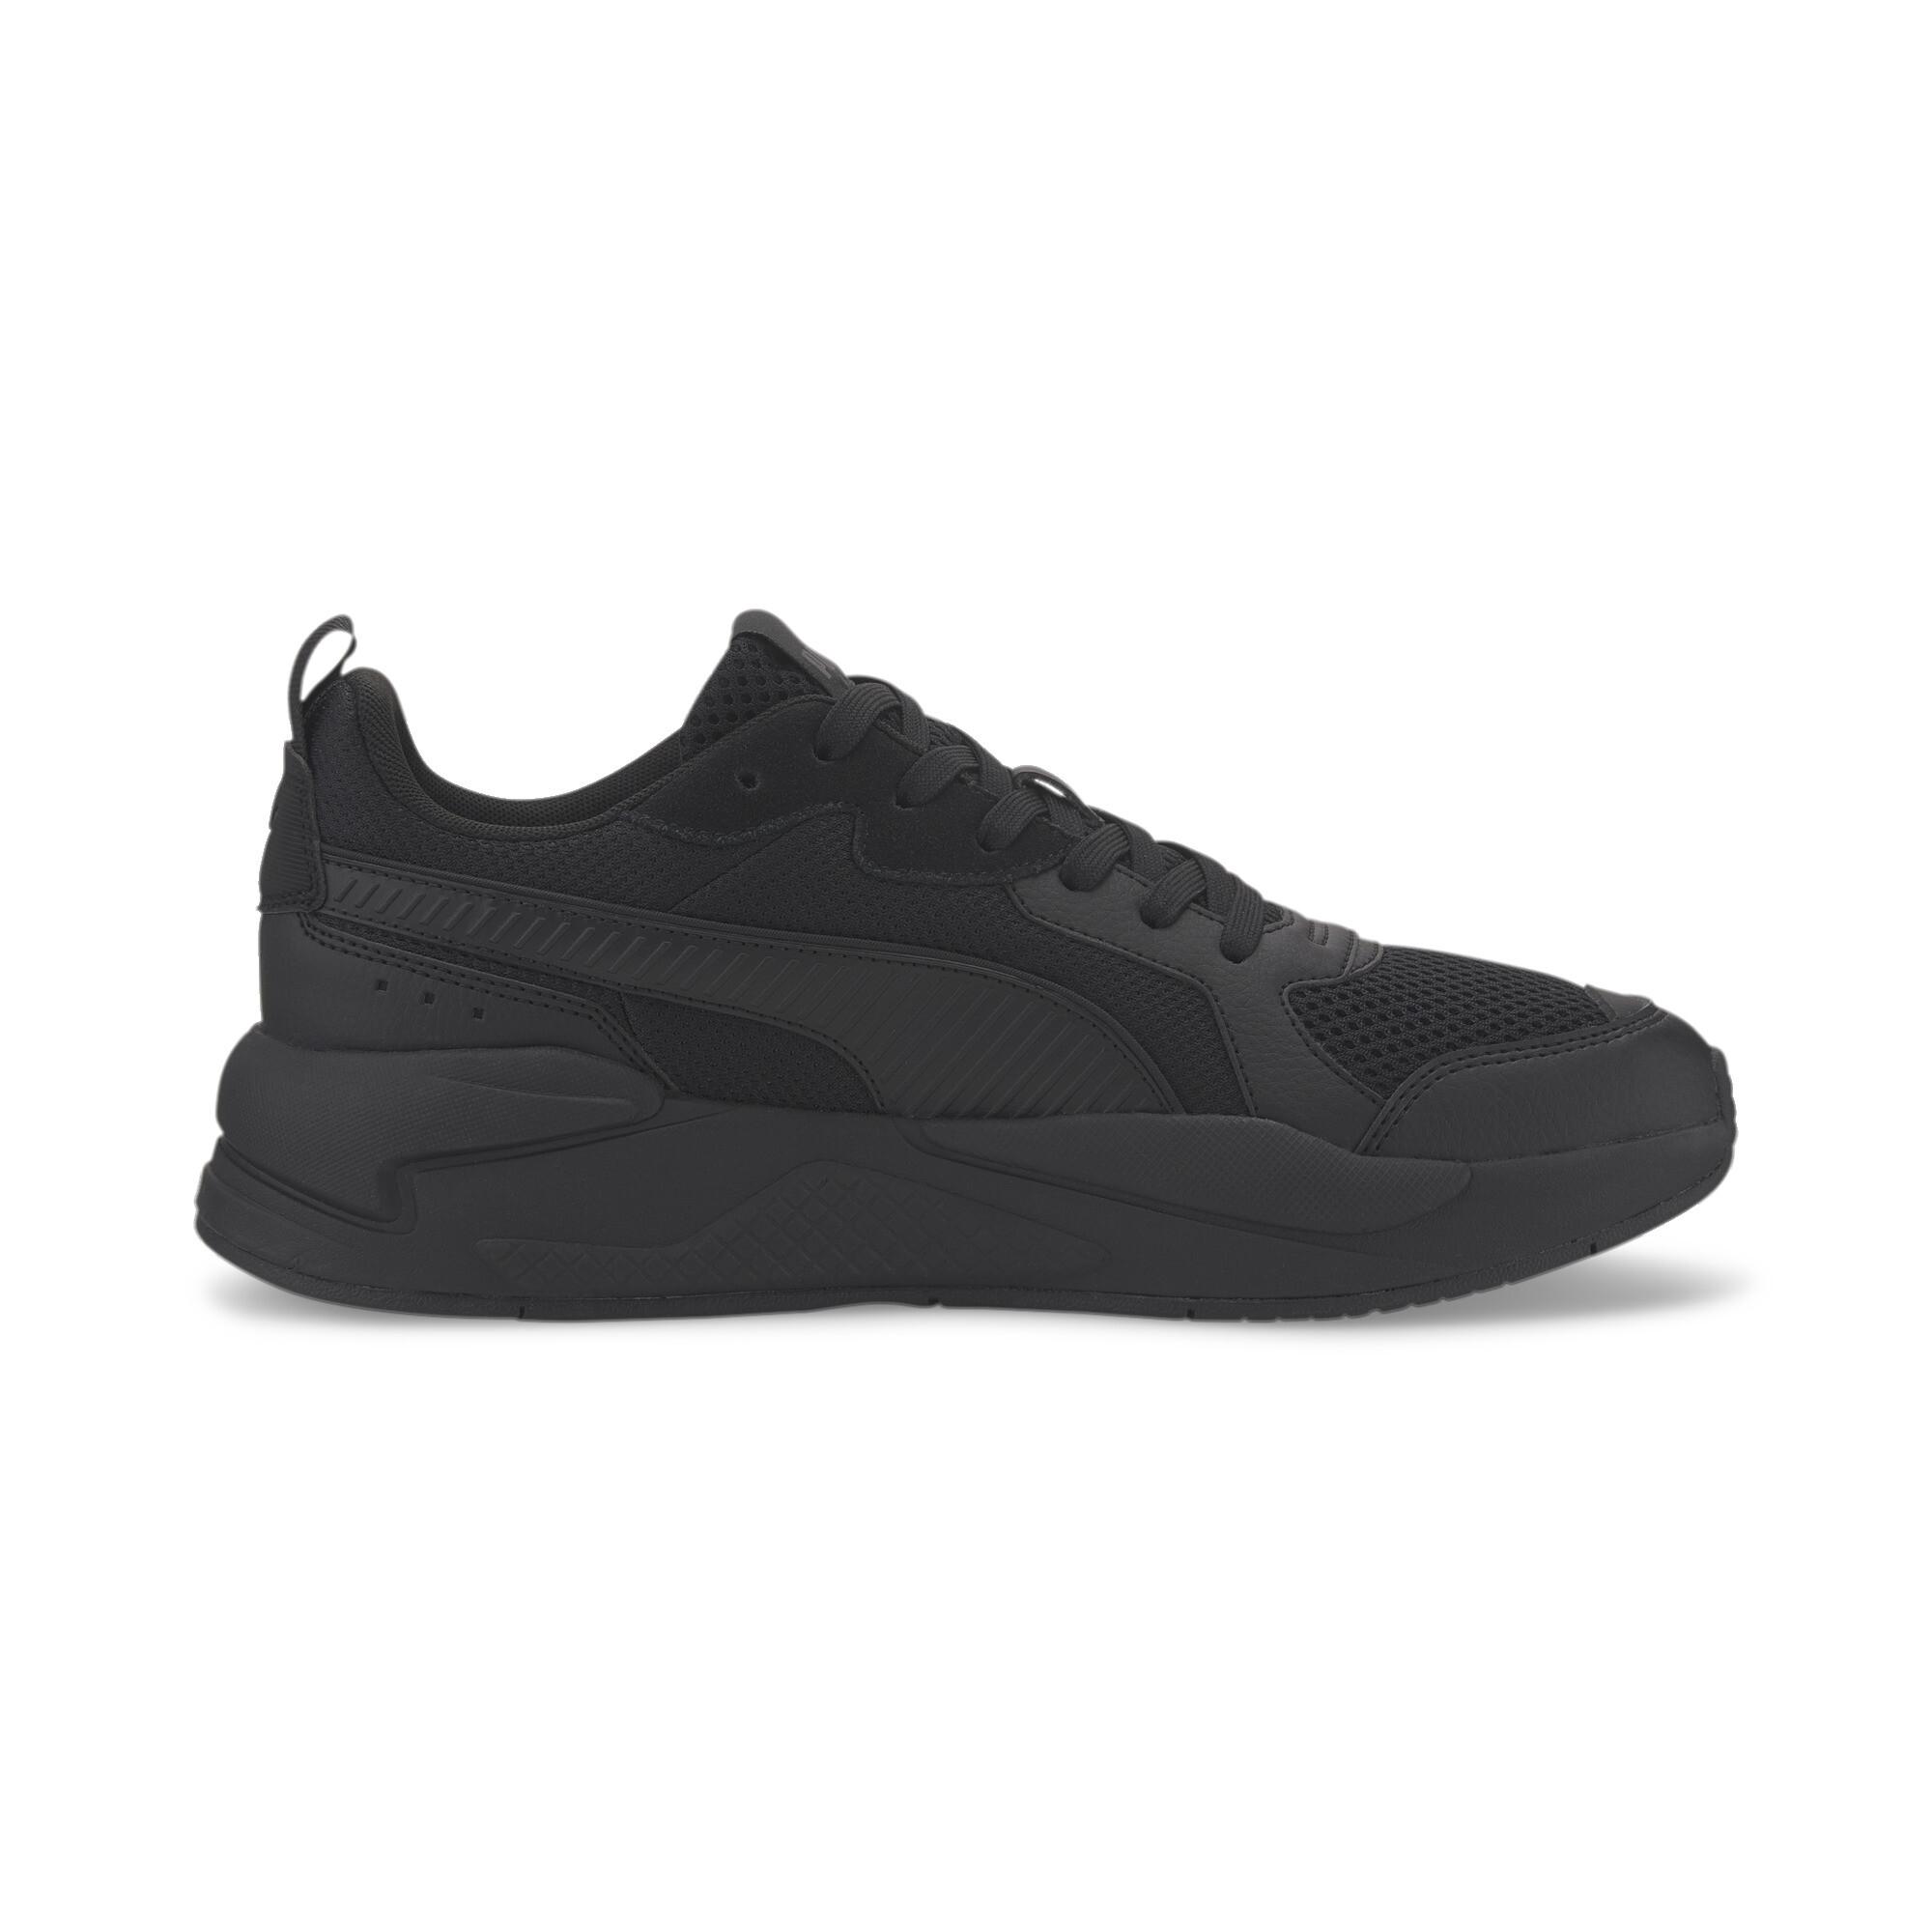 PUMA-Men-039-s-X-RAY-Sneakers thumbnail 21